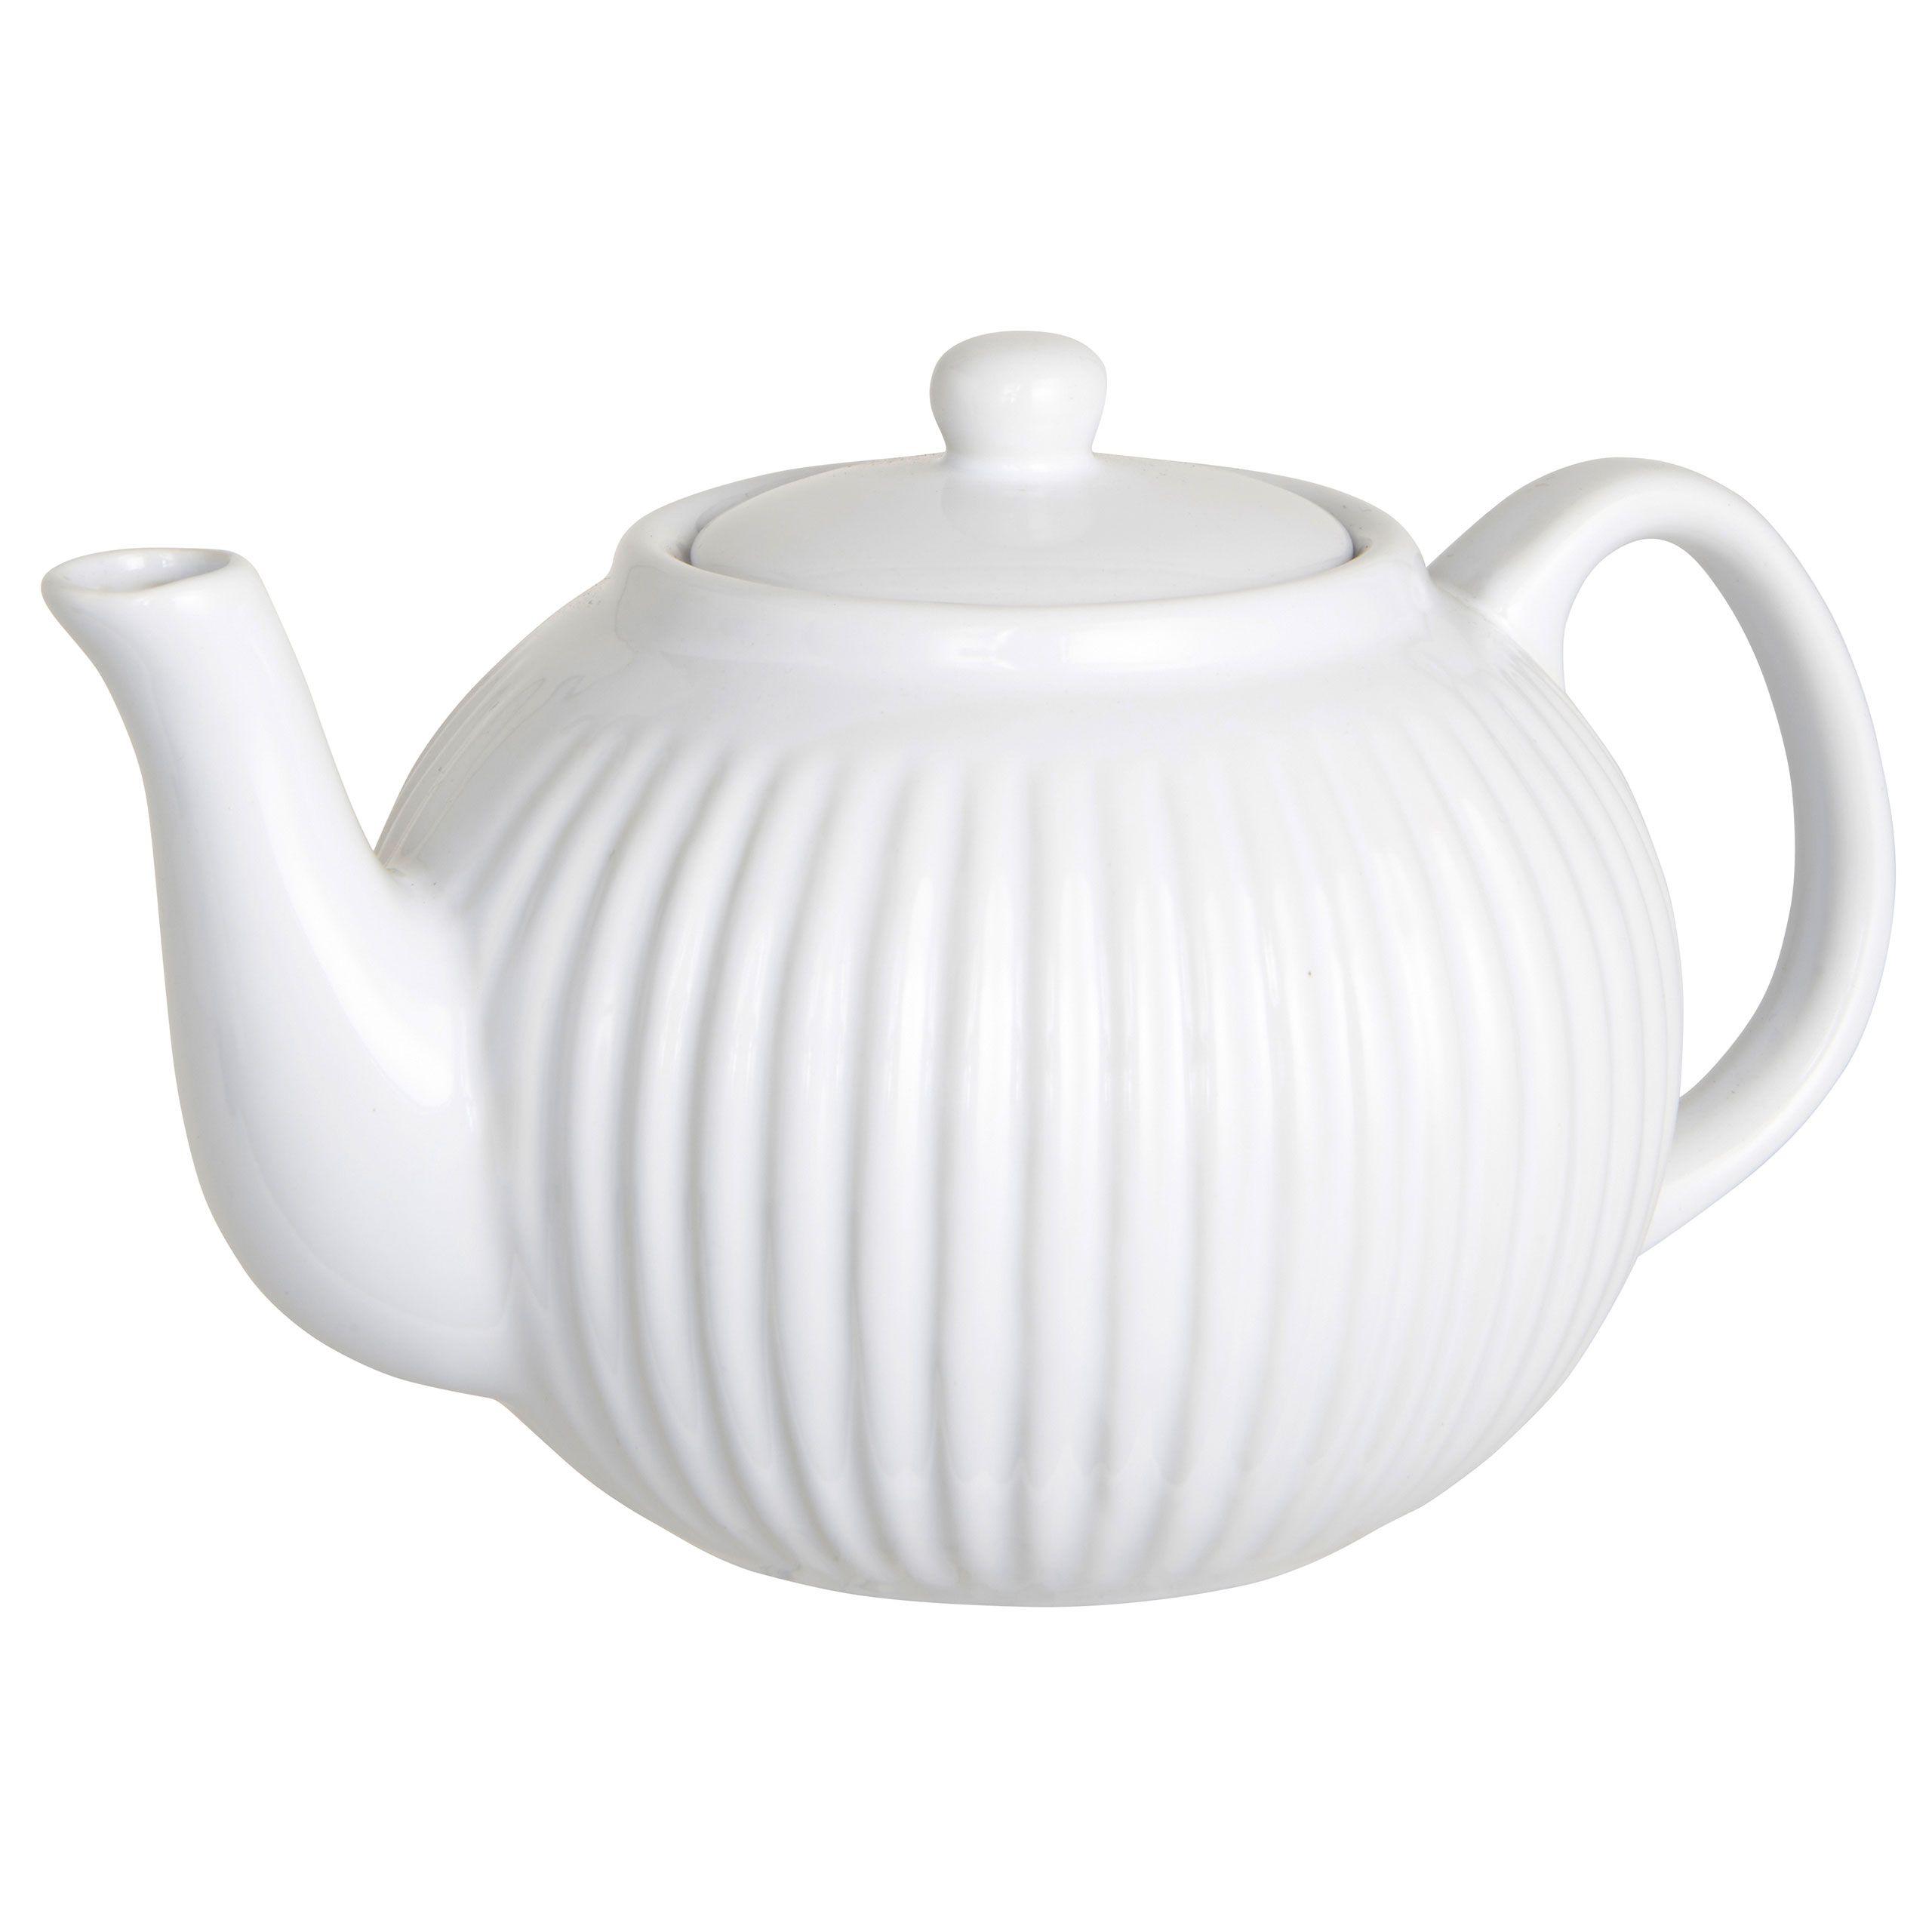 Weiße Teekanne ib laursen mynte teekanne white white